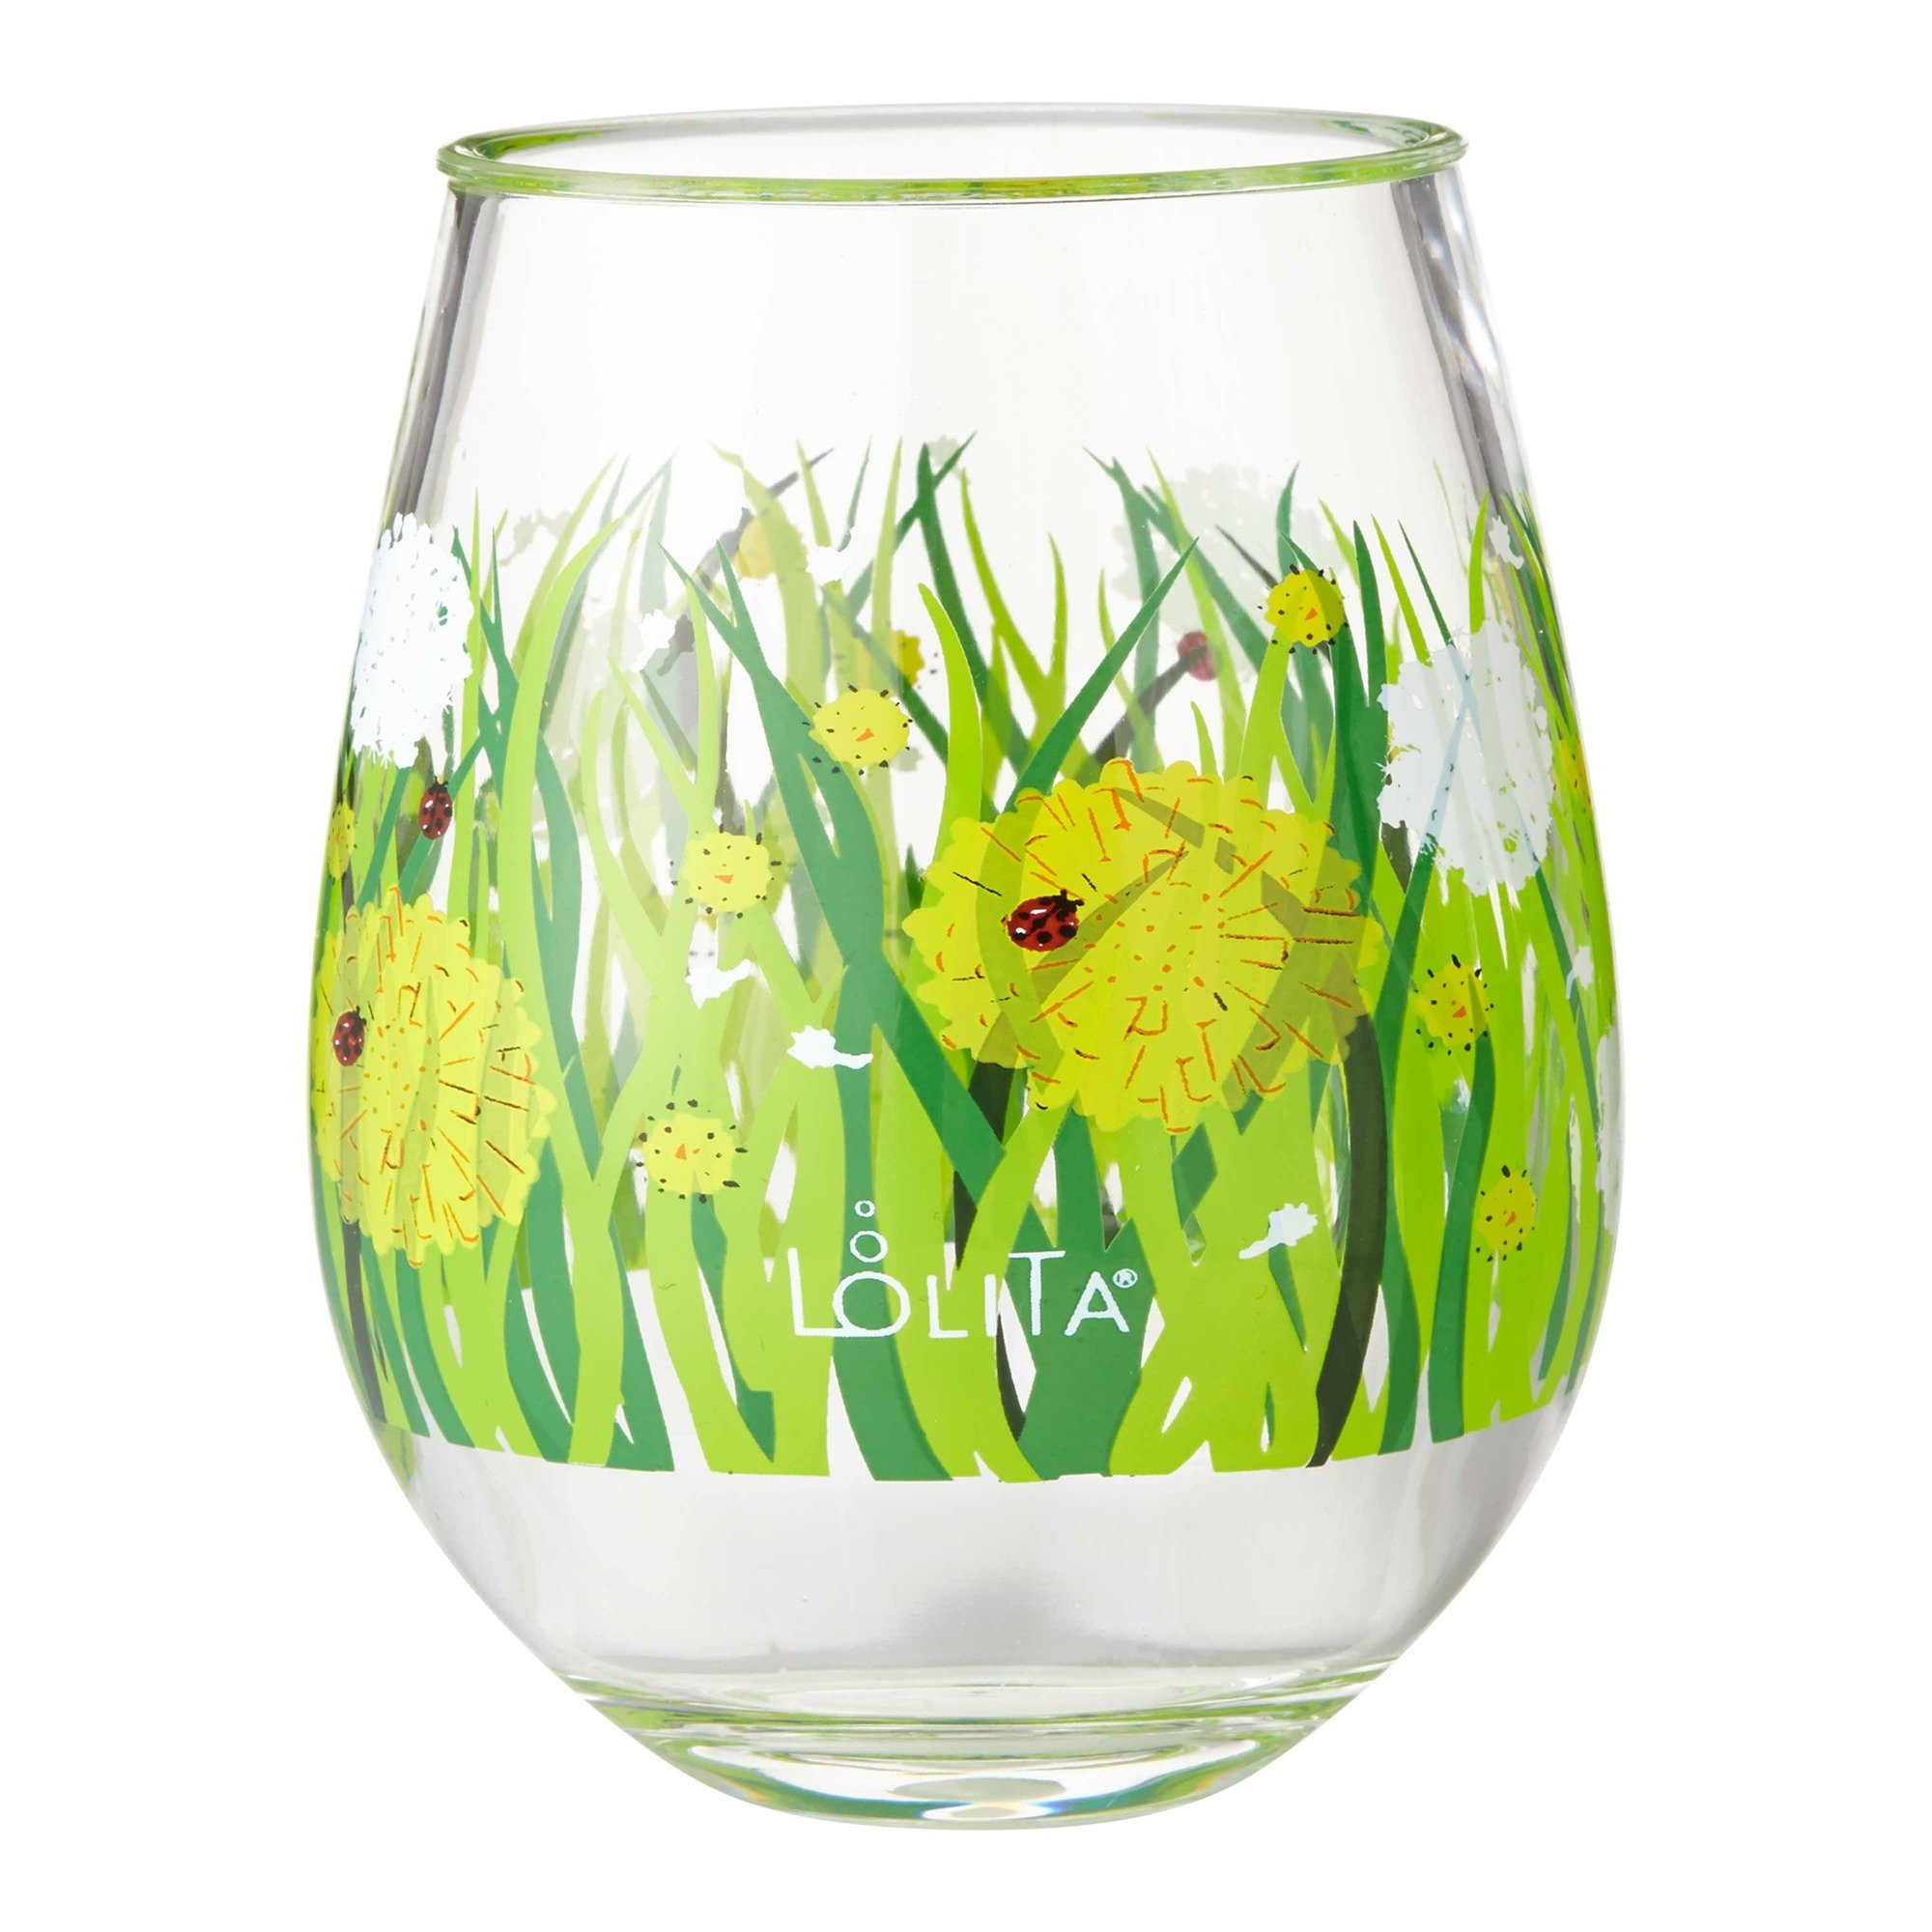 Enesco Designs by Lolita Dandelion Acrylic Stemless Wine Glasses, Set of 2, 17 oz.